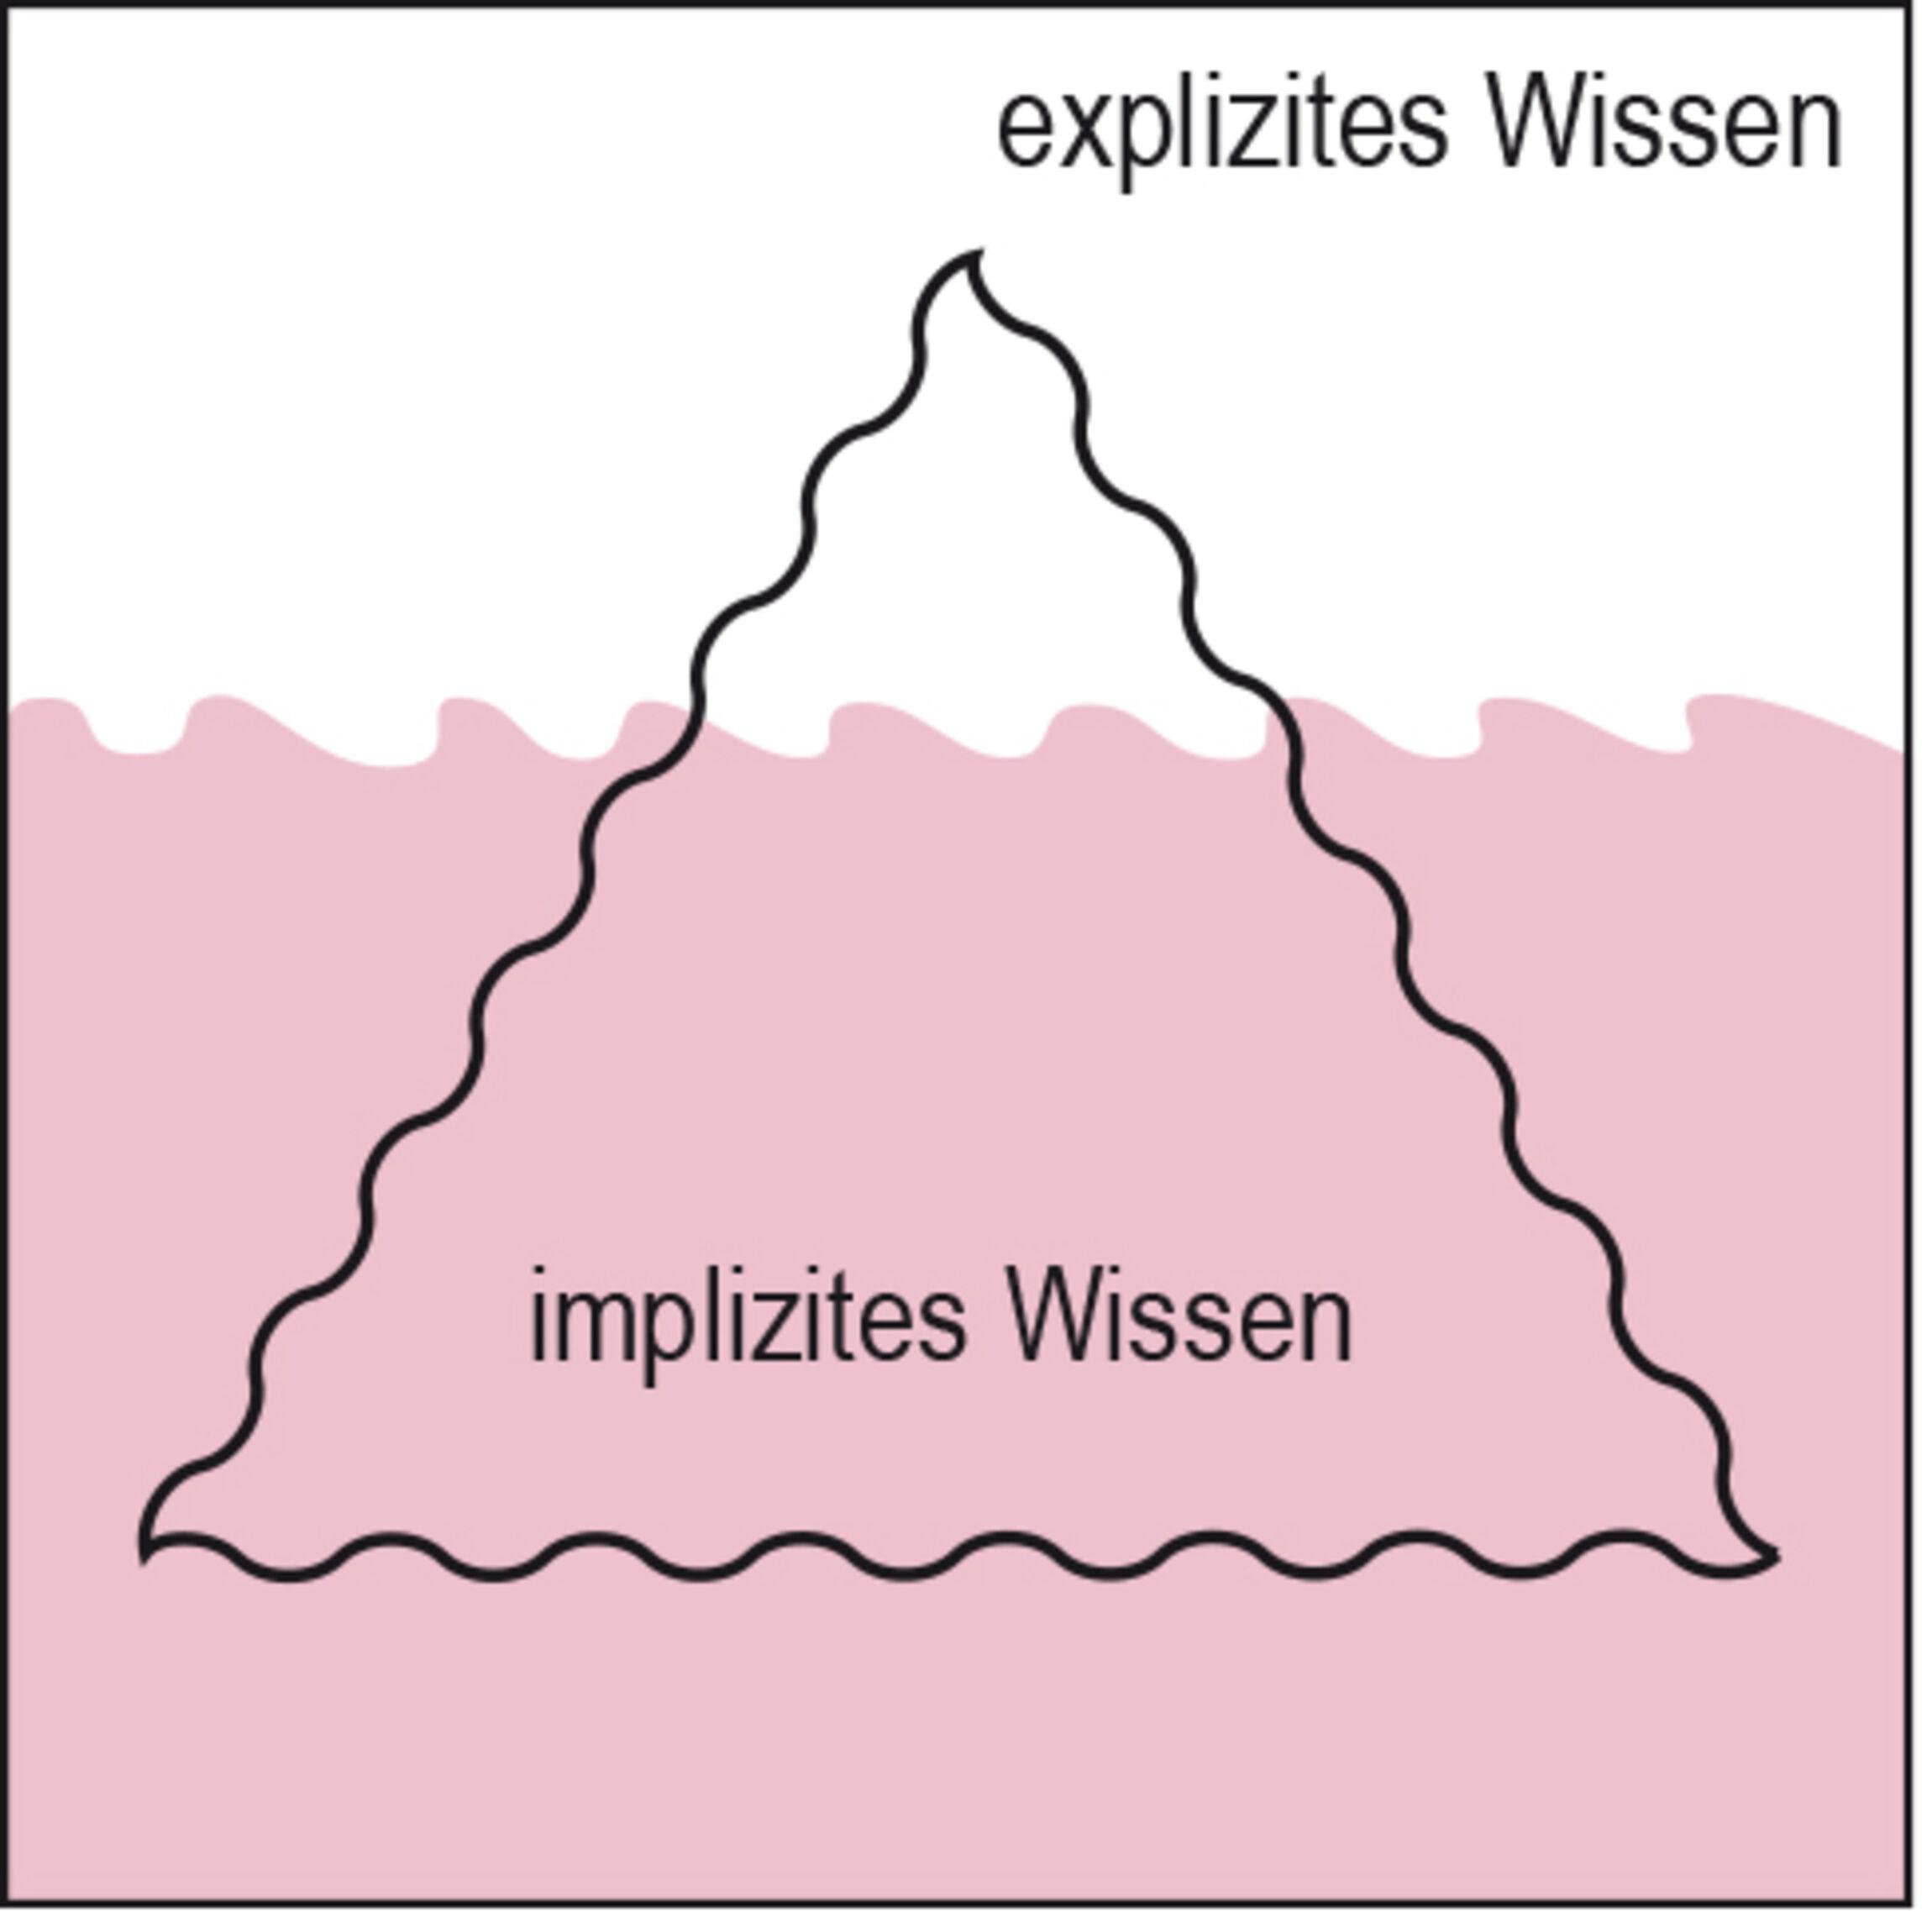 grafik_explizites-implizites-wissen_2